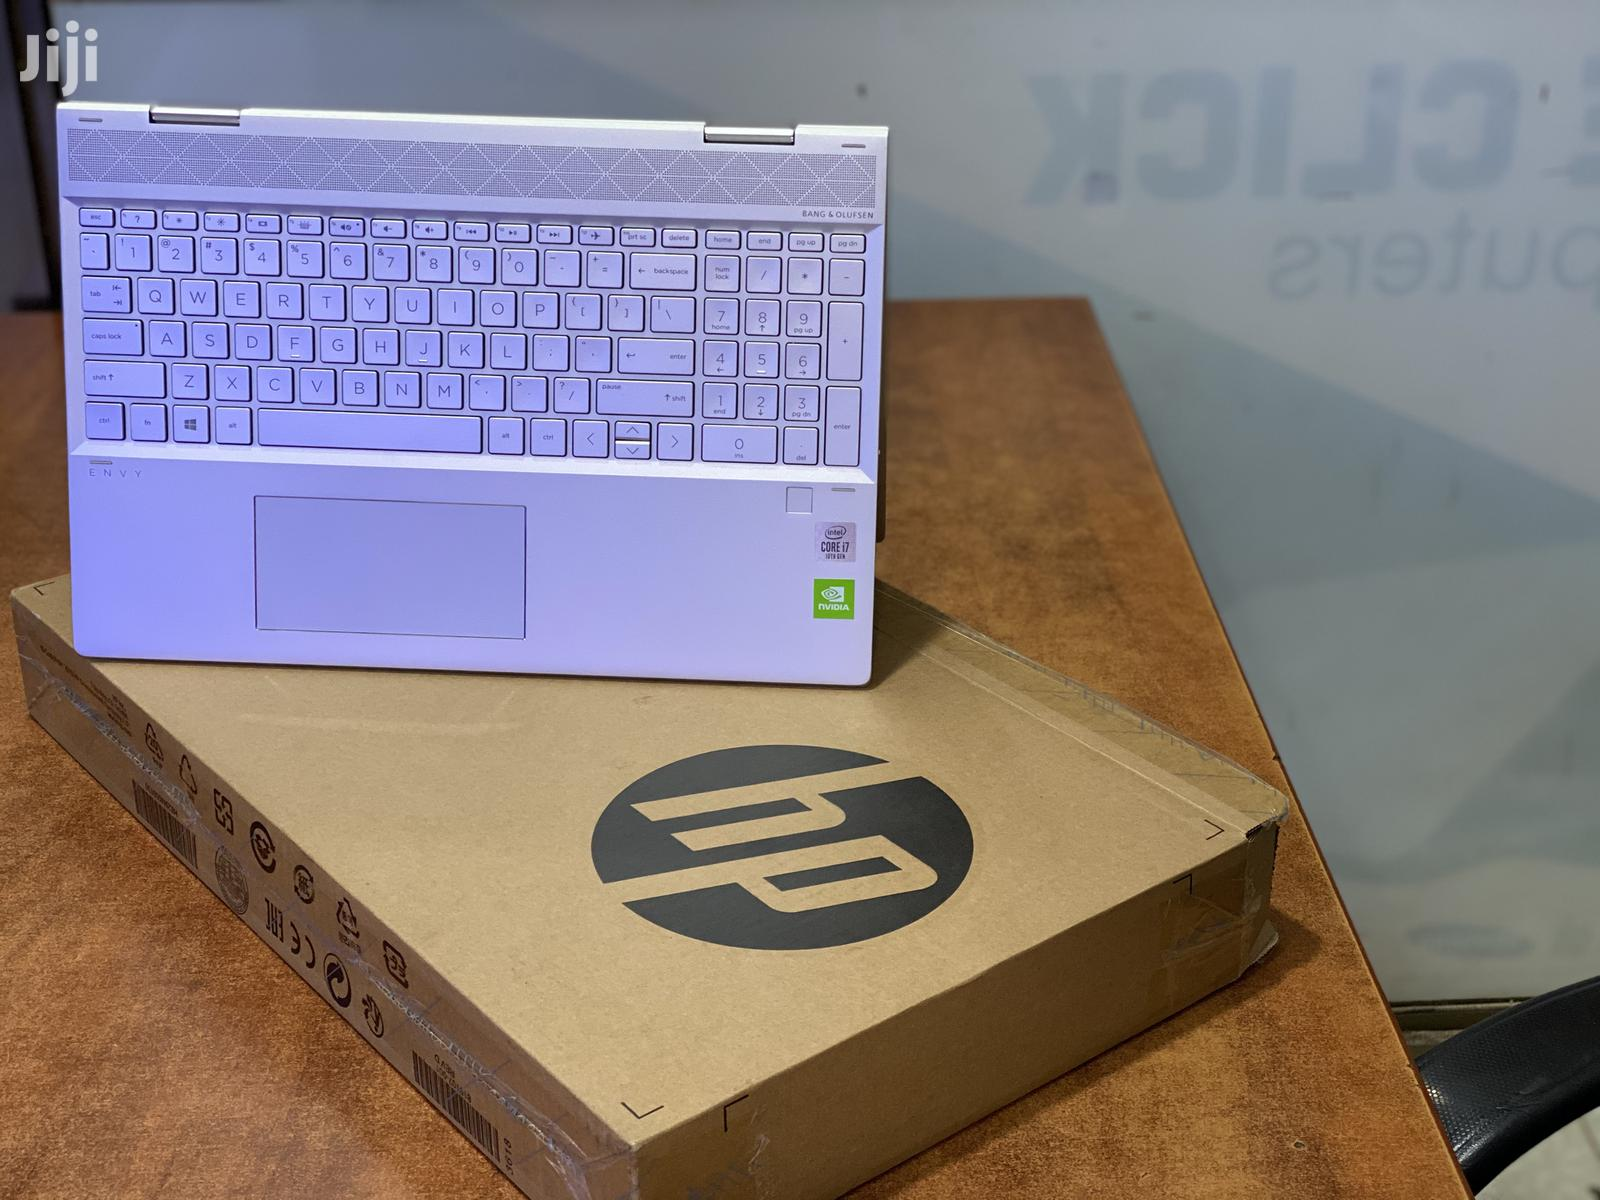 Archive: New Laptop HP Envy 15 16GB Intel Core i7 SSHD (Hybrid) 512GB